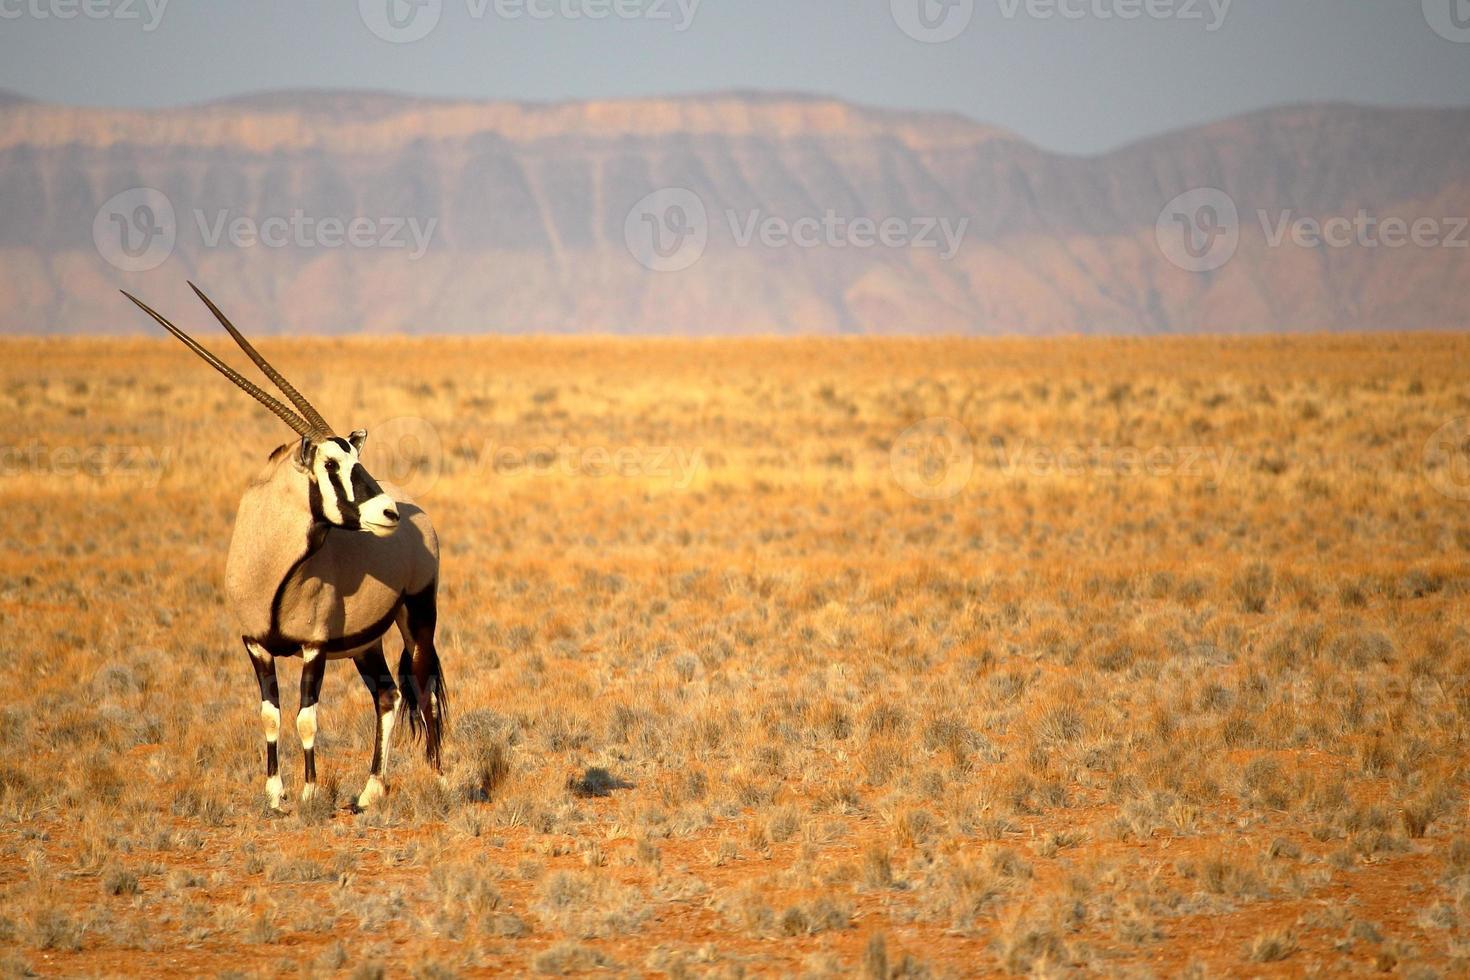 oryx nabij sossusvlei, namibië foto